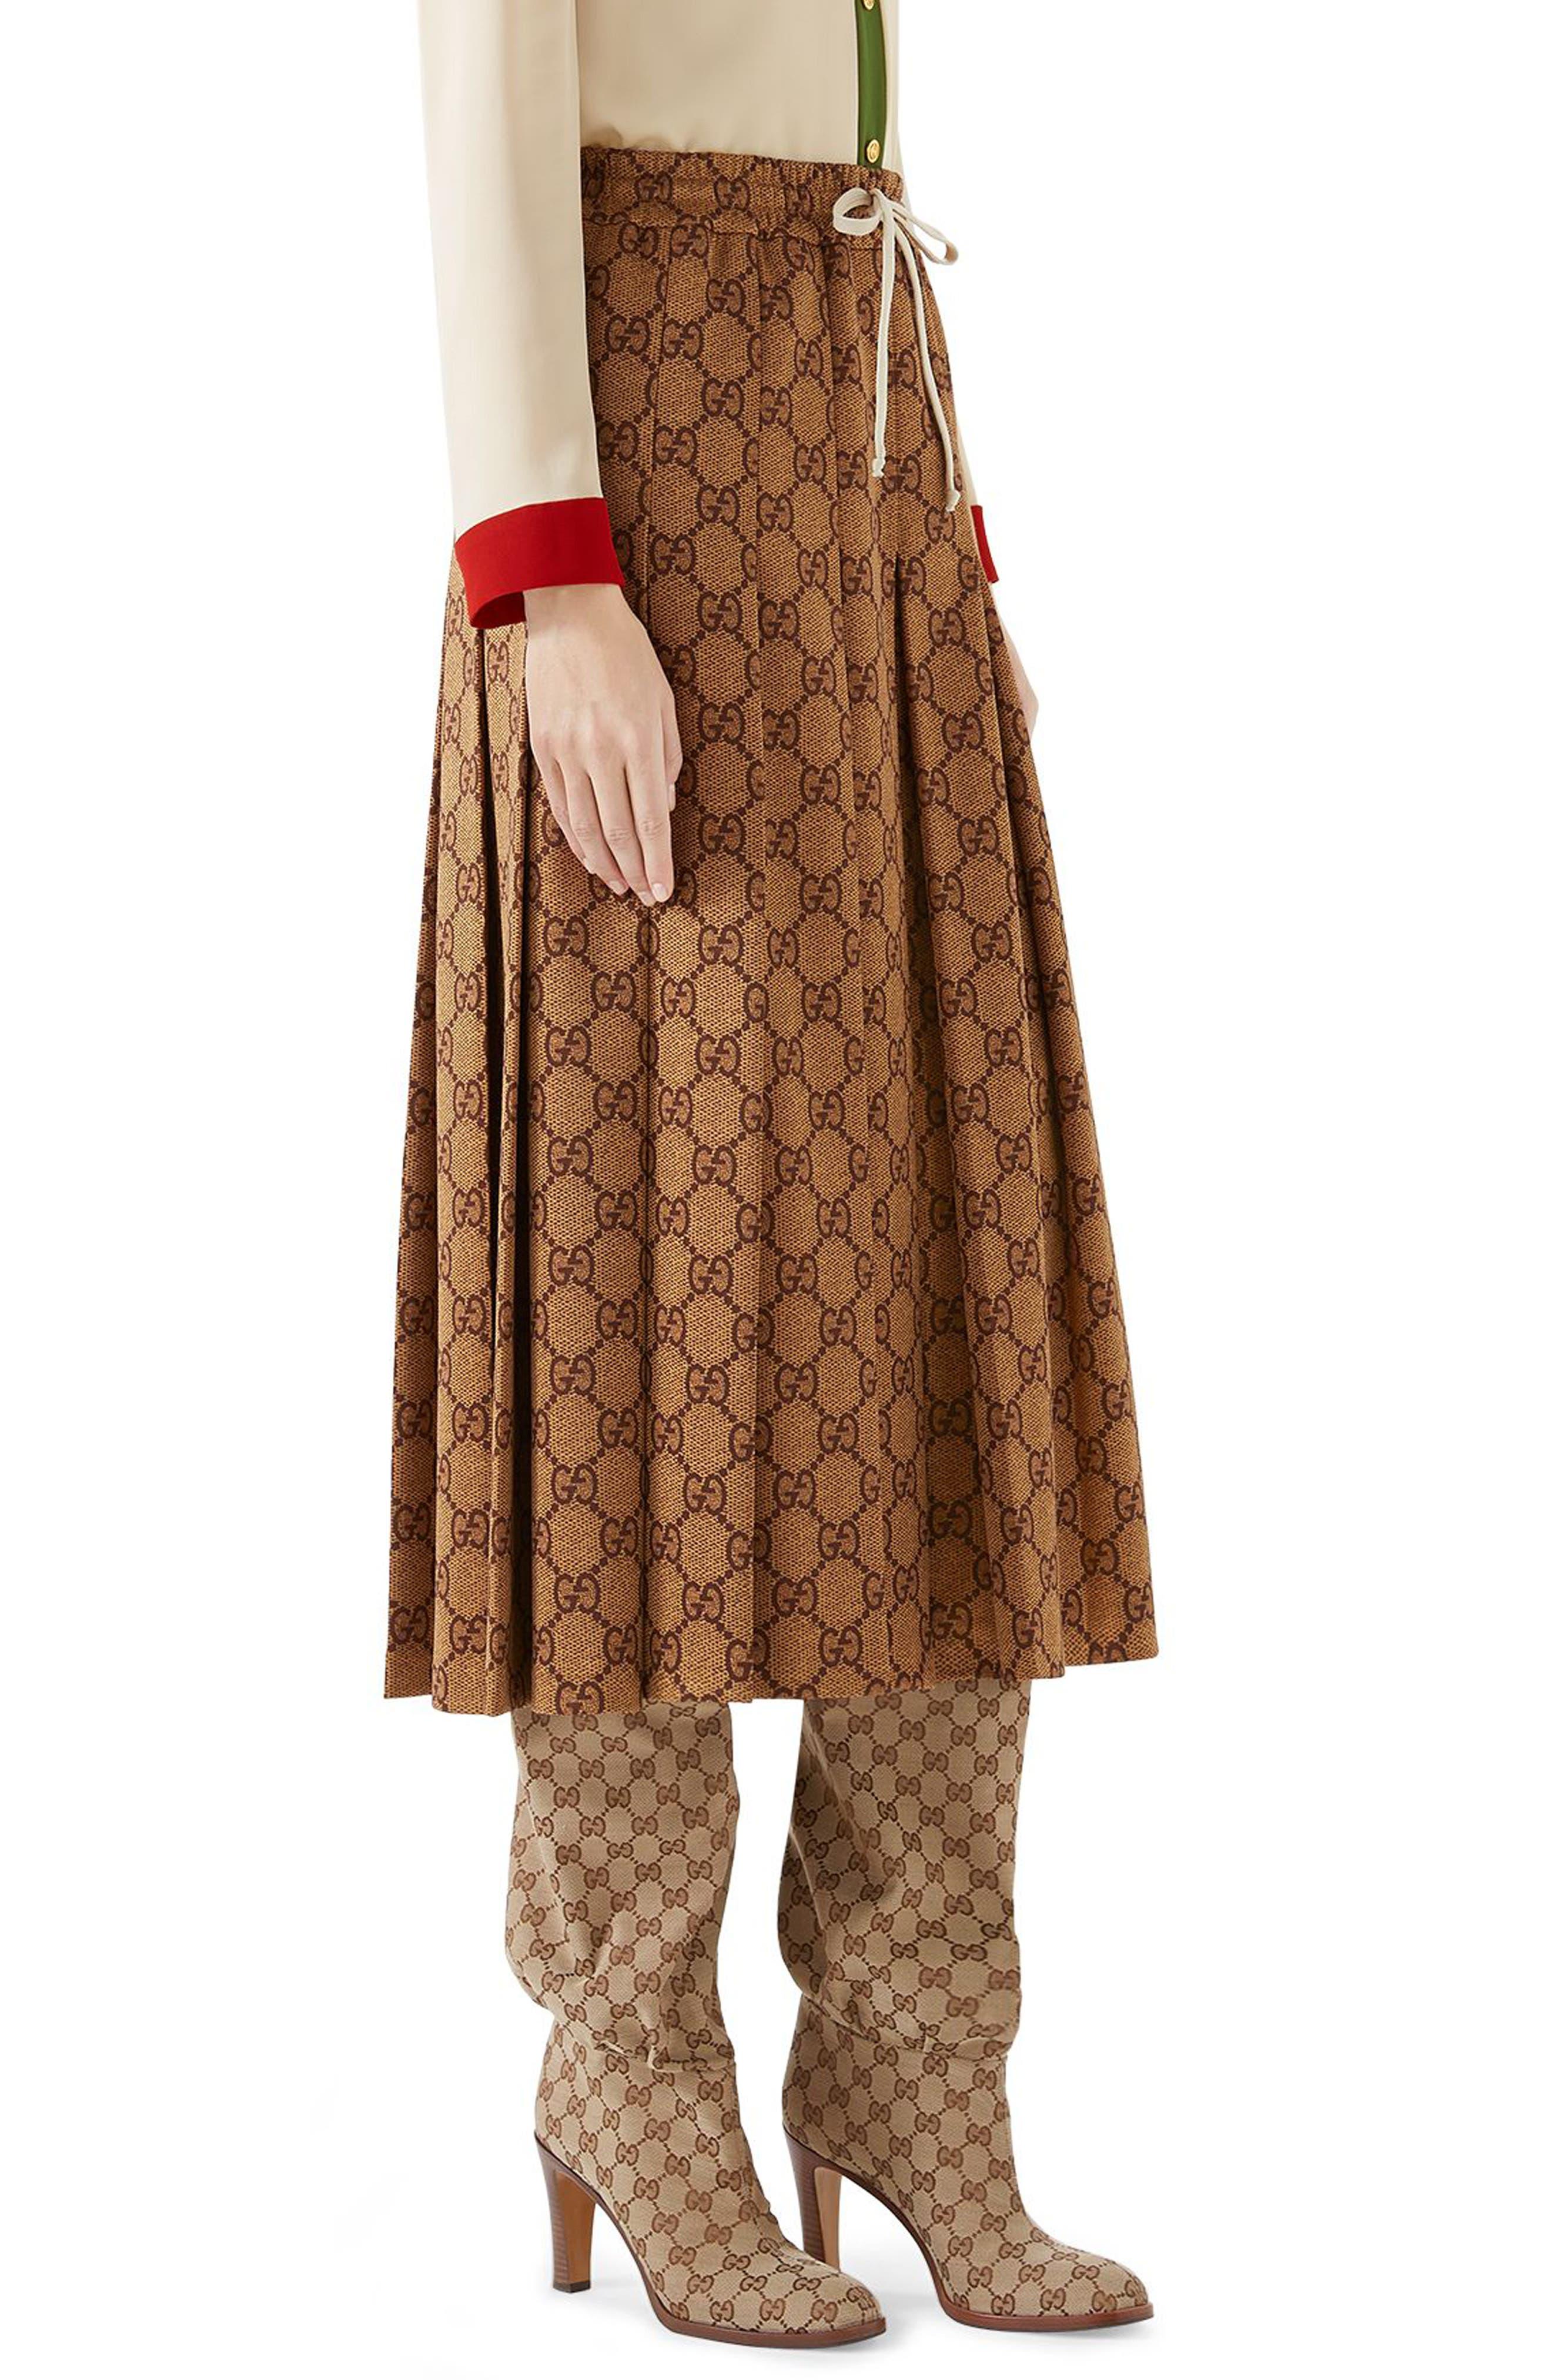 GG Print Pleated Midi Skirt,                             Alternate thumbnail 3, color,                             VINTAGE CAMEL